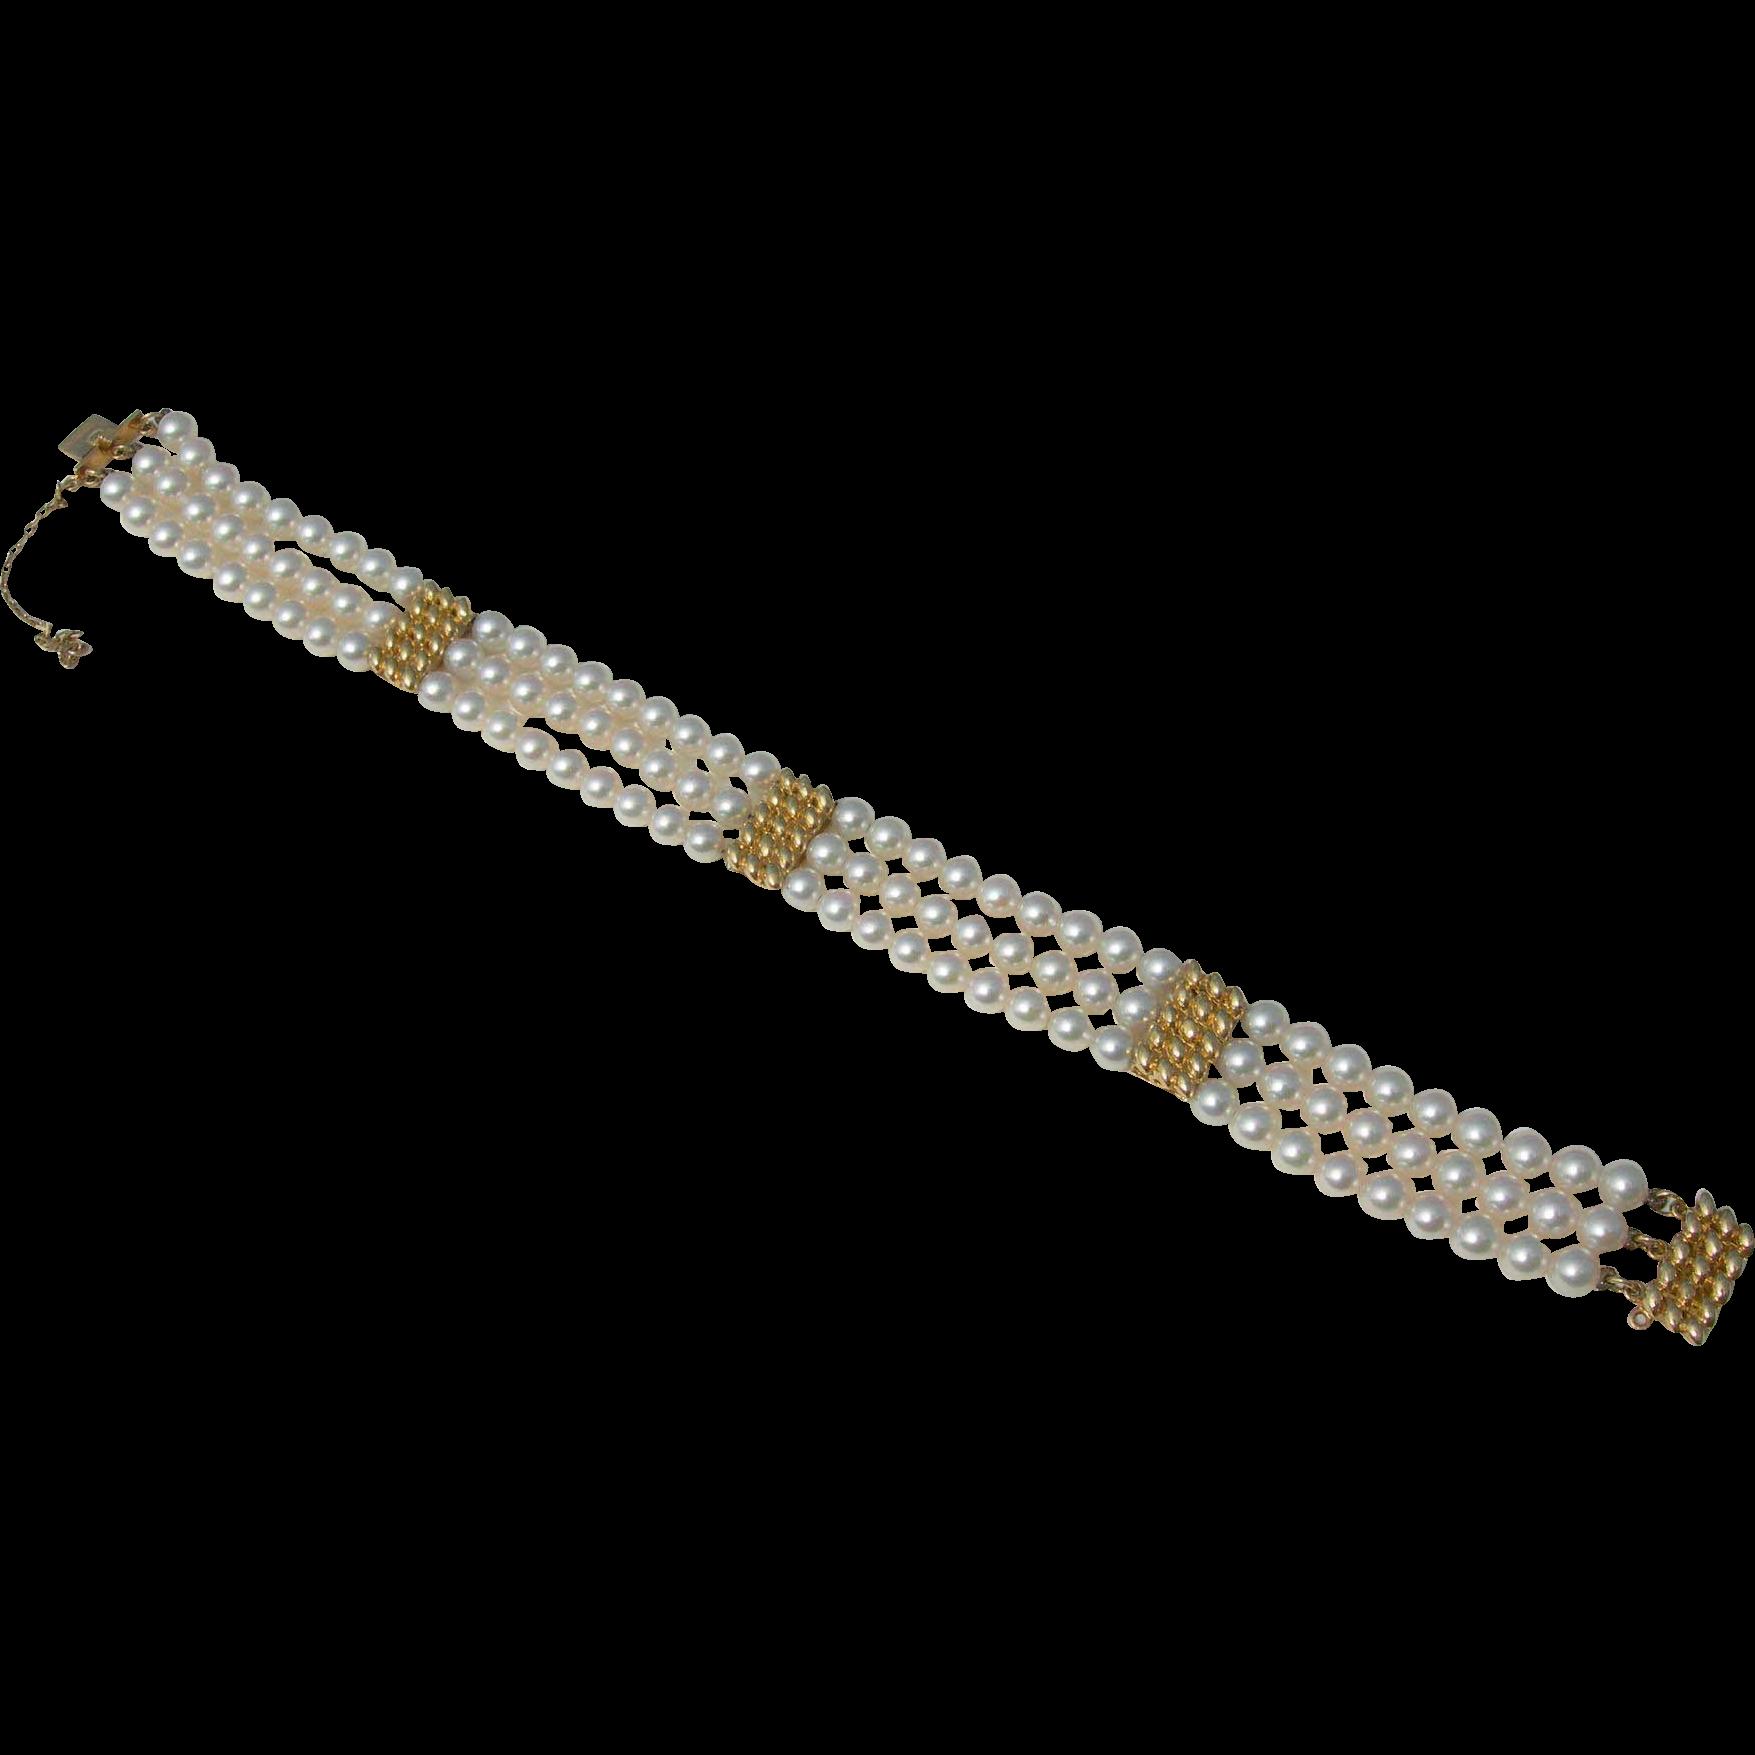 Mikimoto Pearls - 18k Yellow Gold -  3 Strand Bracelet